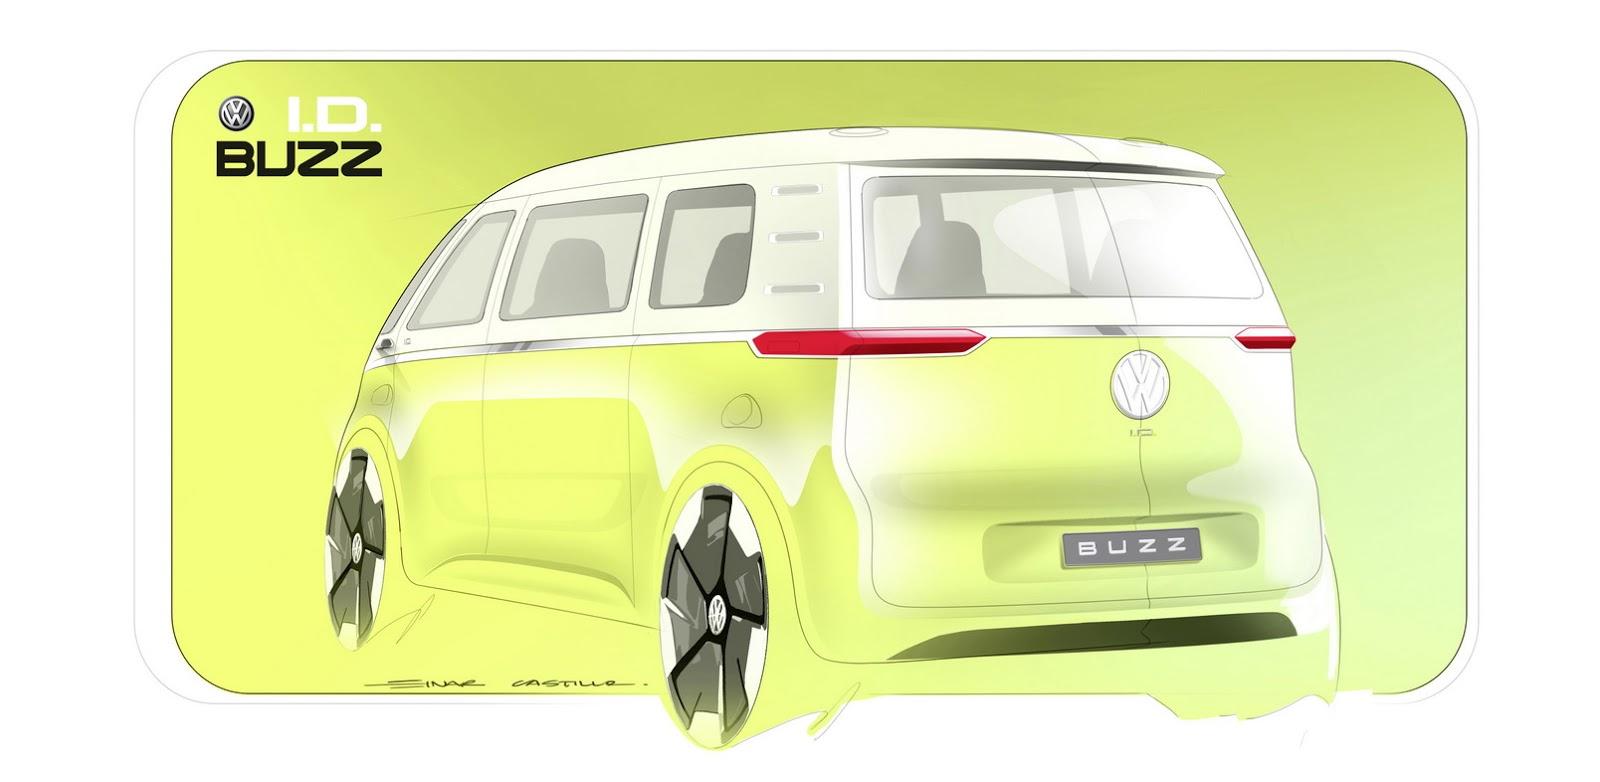 Volkswagen I.D. Buzz Concept (46)